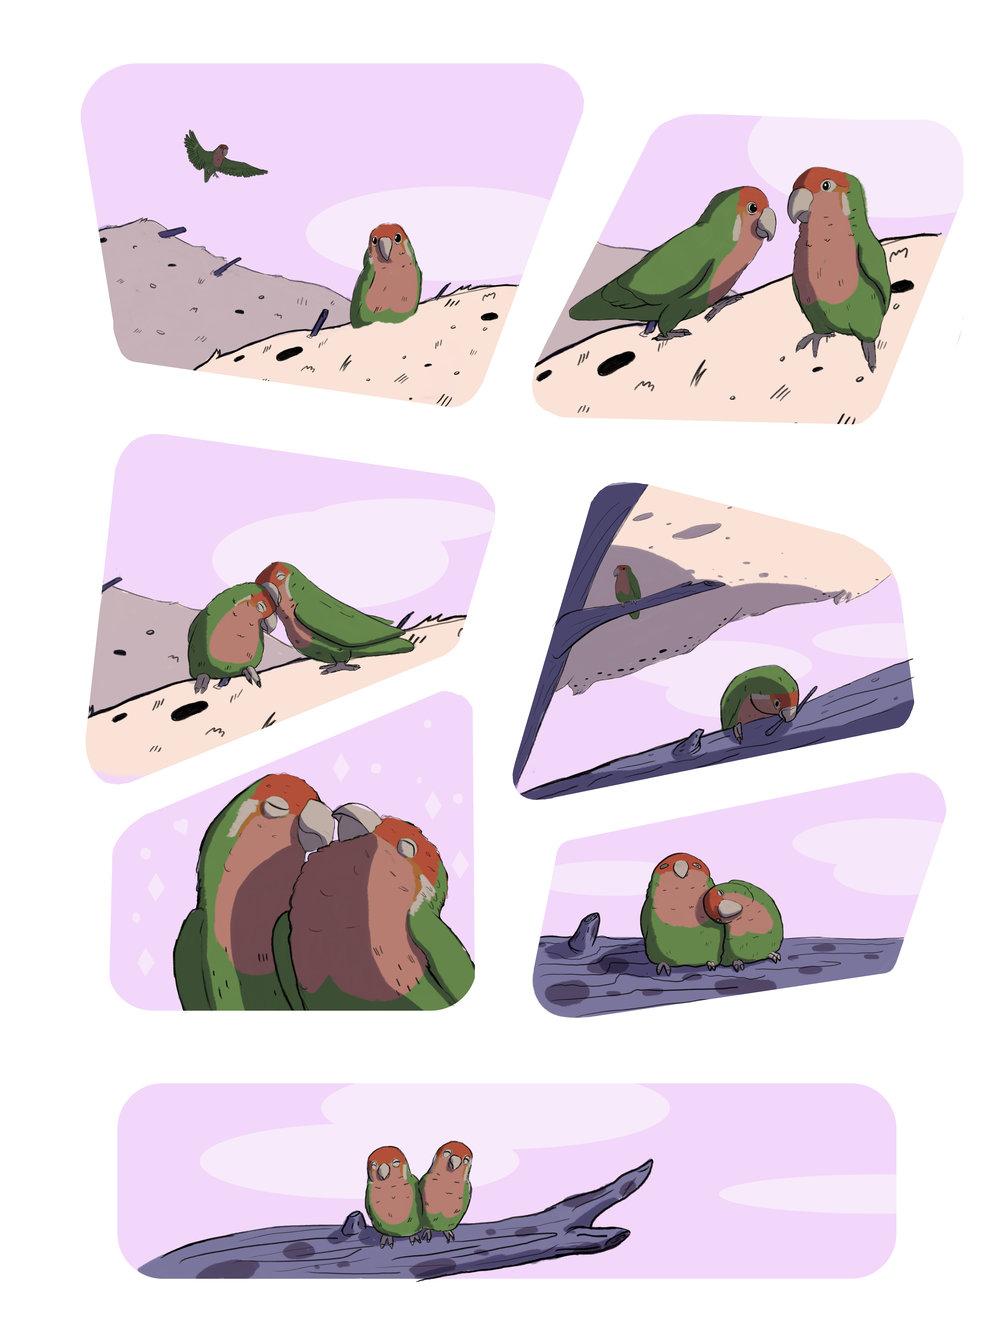 Alex S lovebird comic page03.jpg